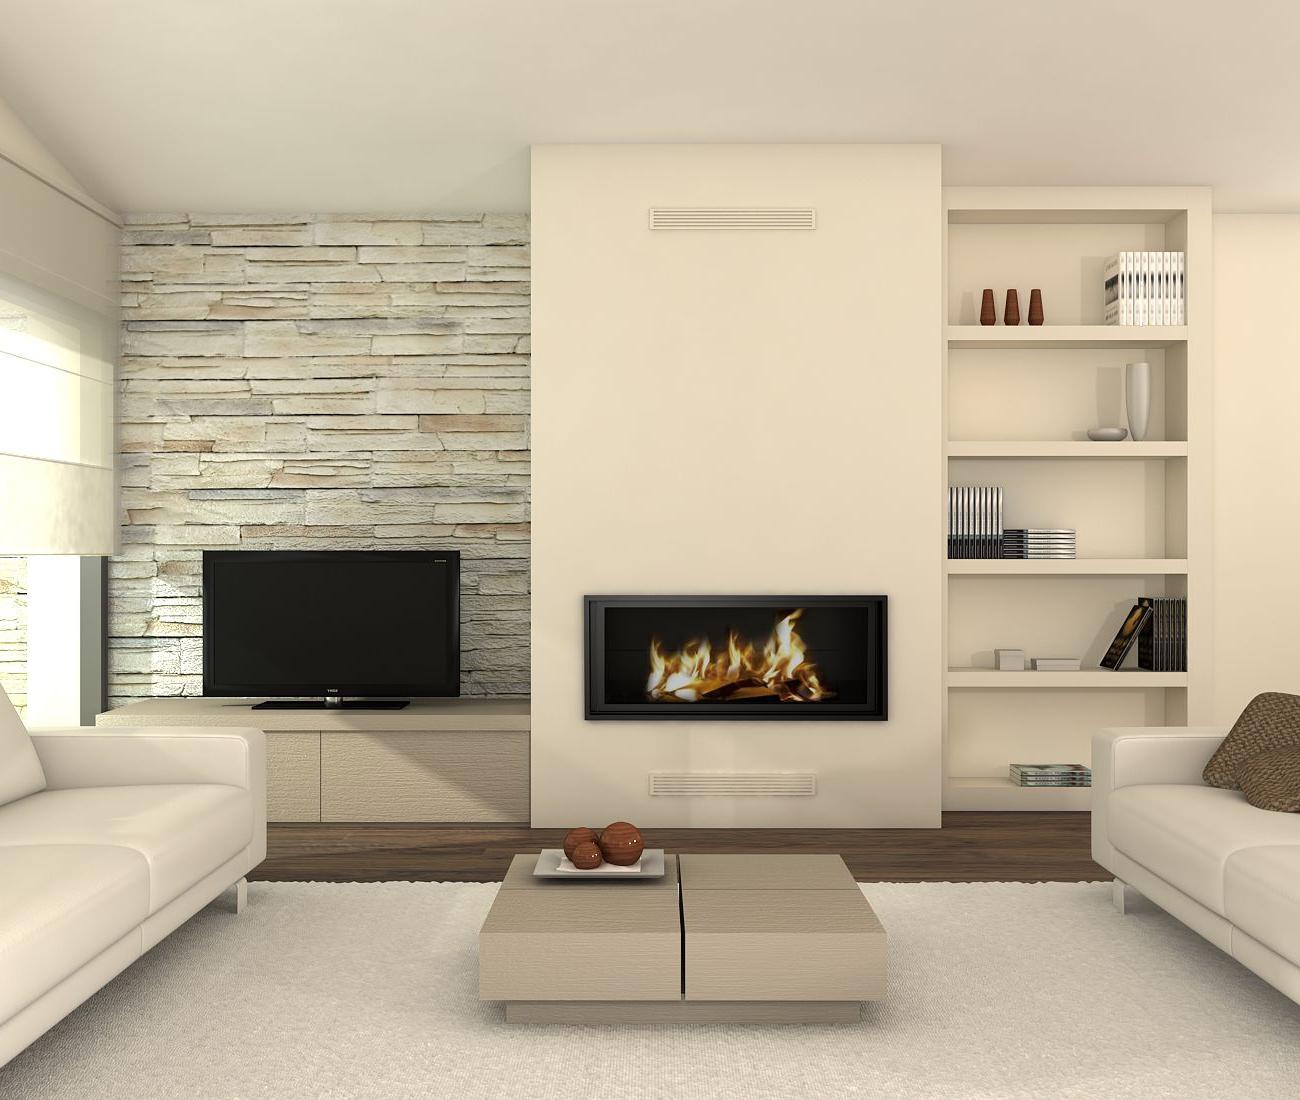 Muebles De Salon Con Chimenea Integrada 0gdr Minimalist Fireplace D A Great Neutral Color Scheme for Overall